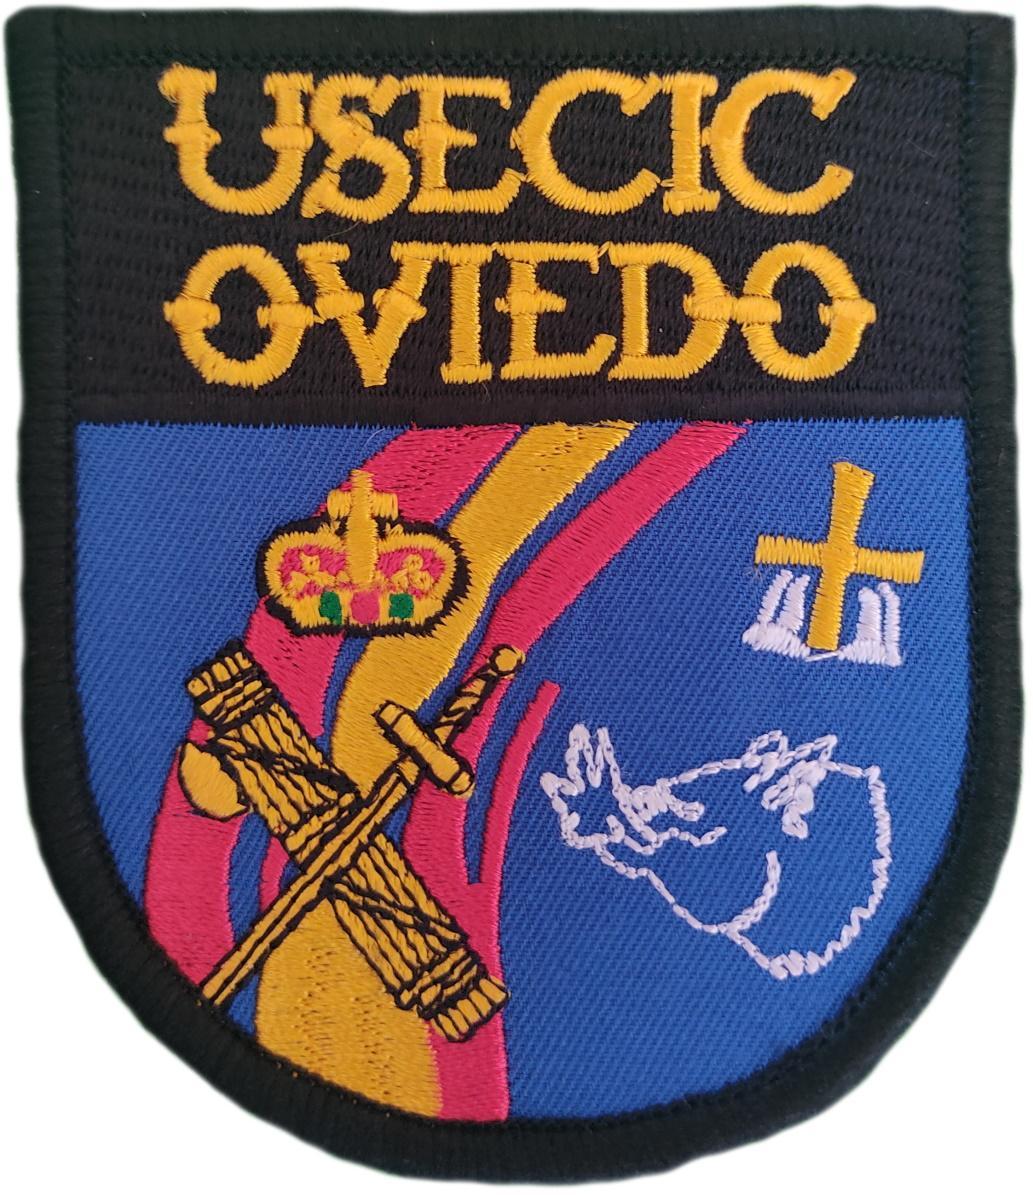 Guardia Civil Usecic Oviedo parche insignia emblema distintivo bordado